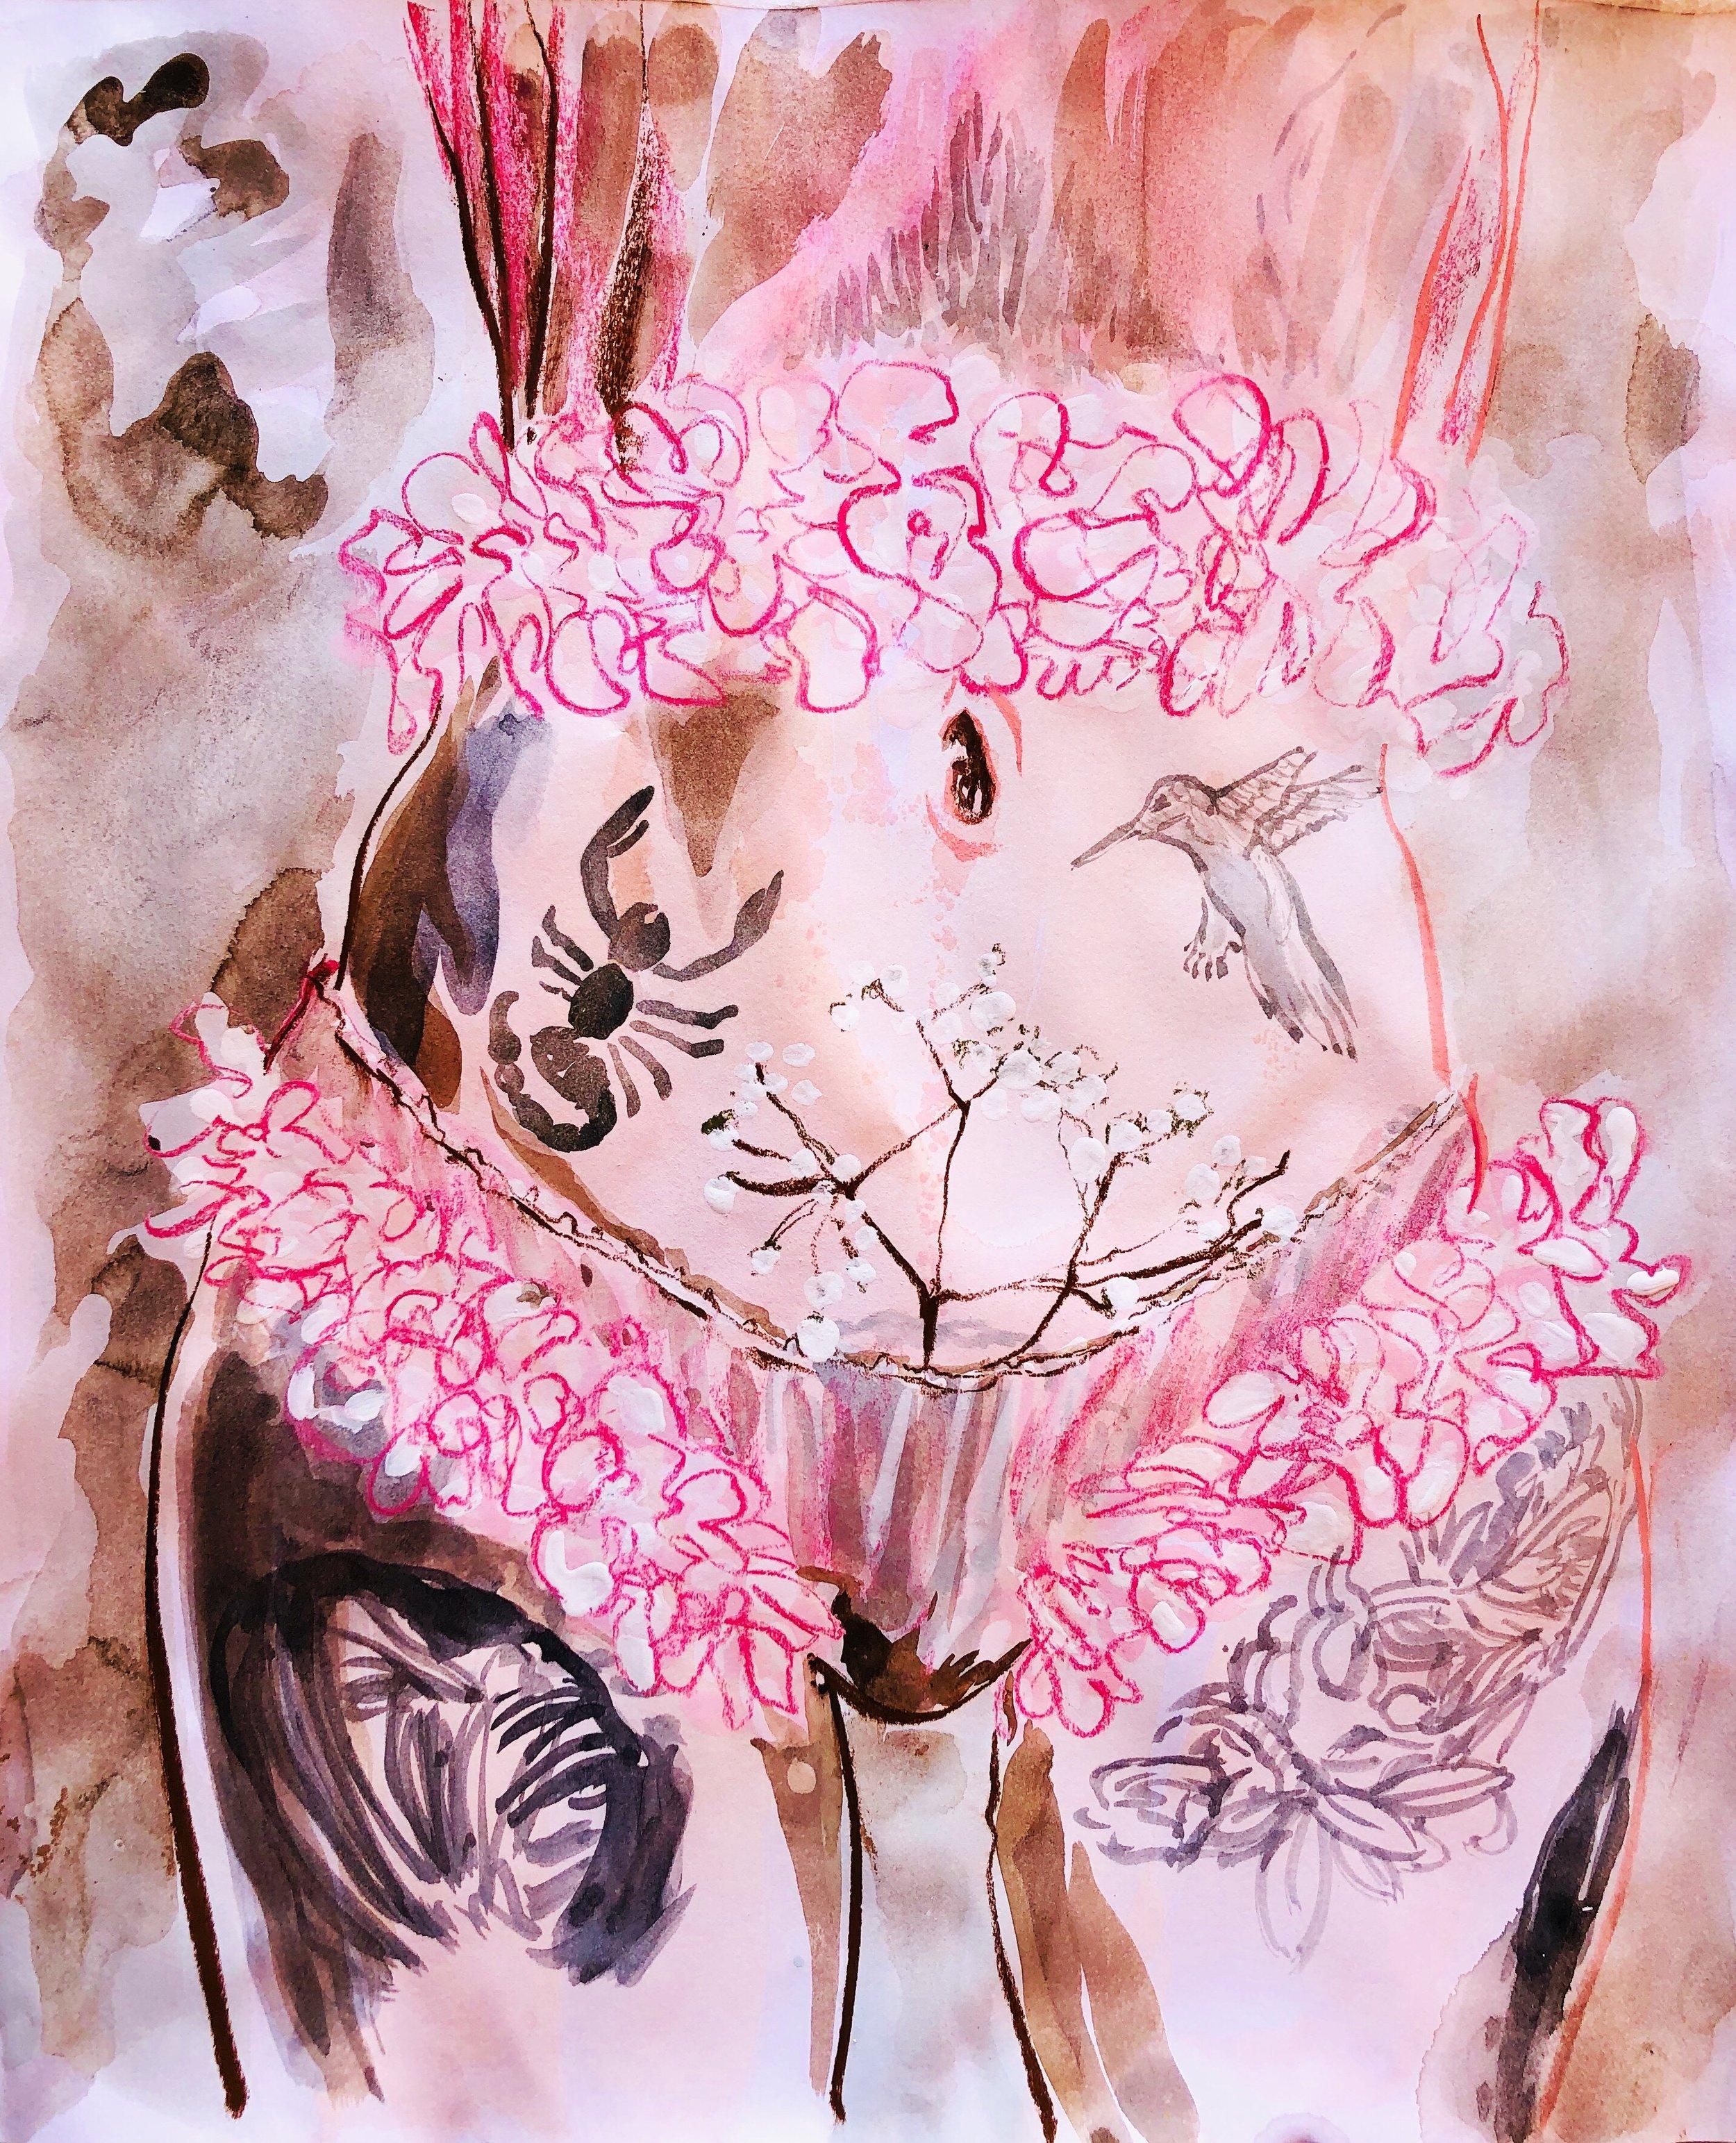 My body parts & @misscrofton lingerie.